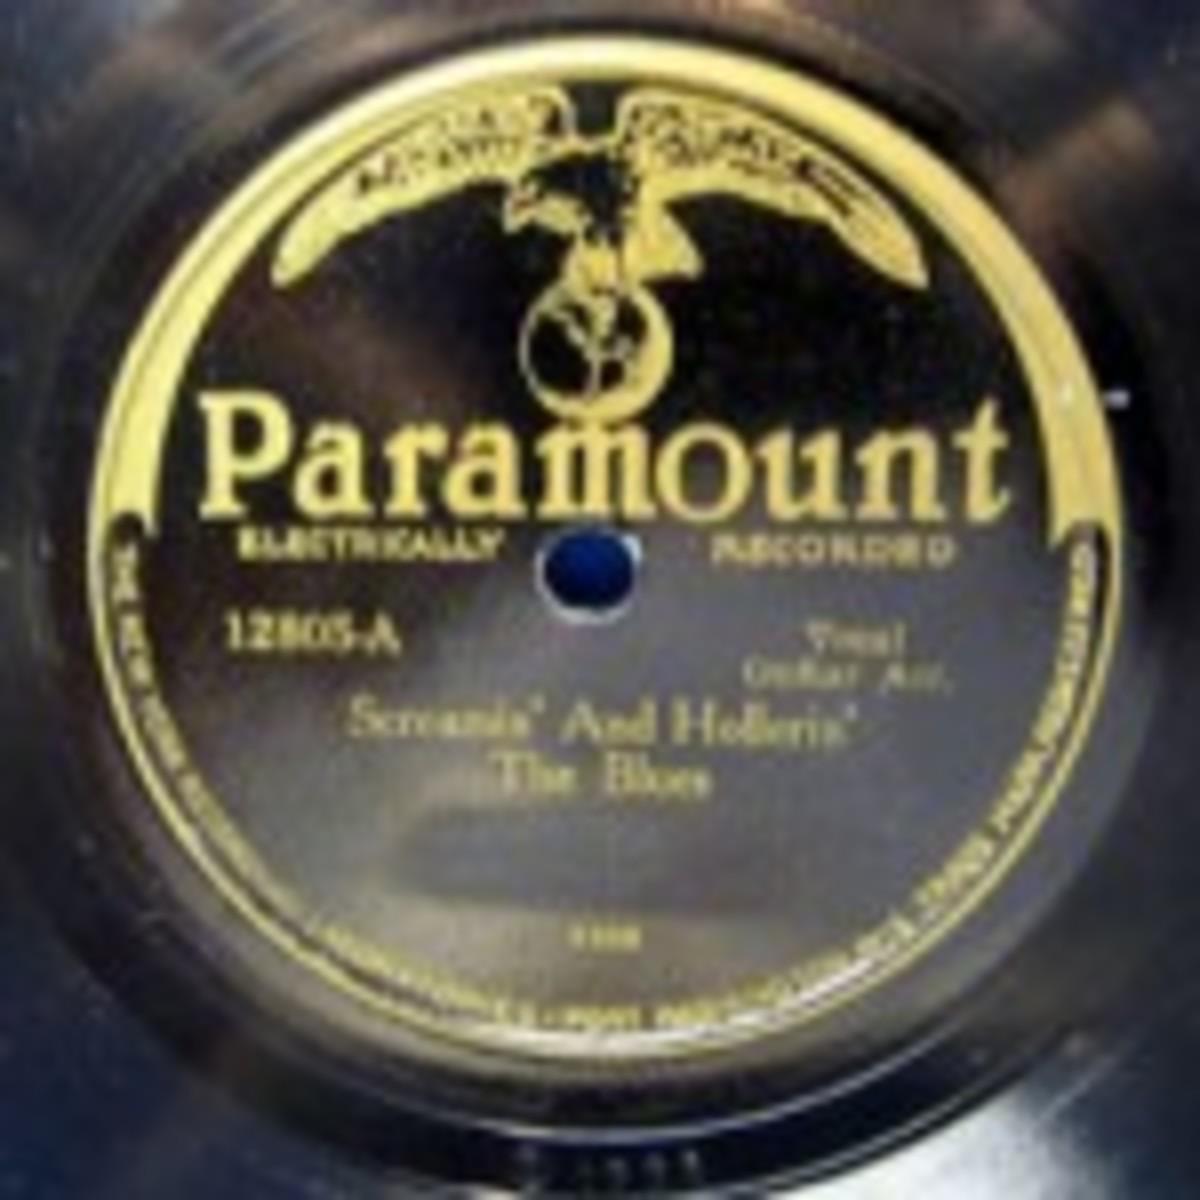 Charley Patton Paramount 12805